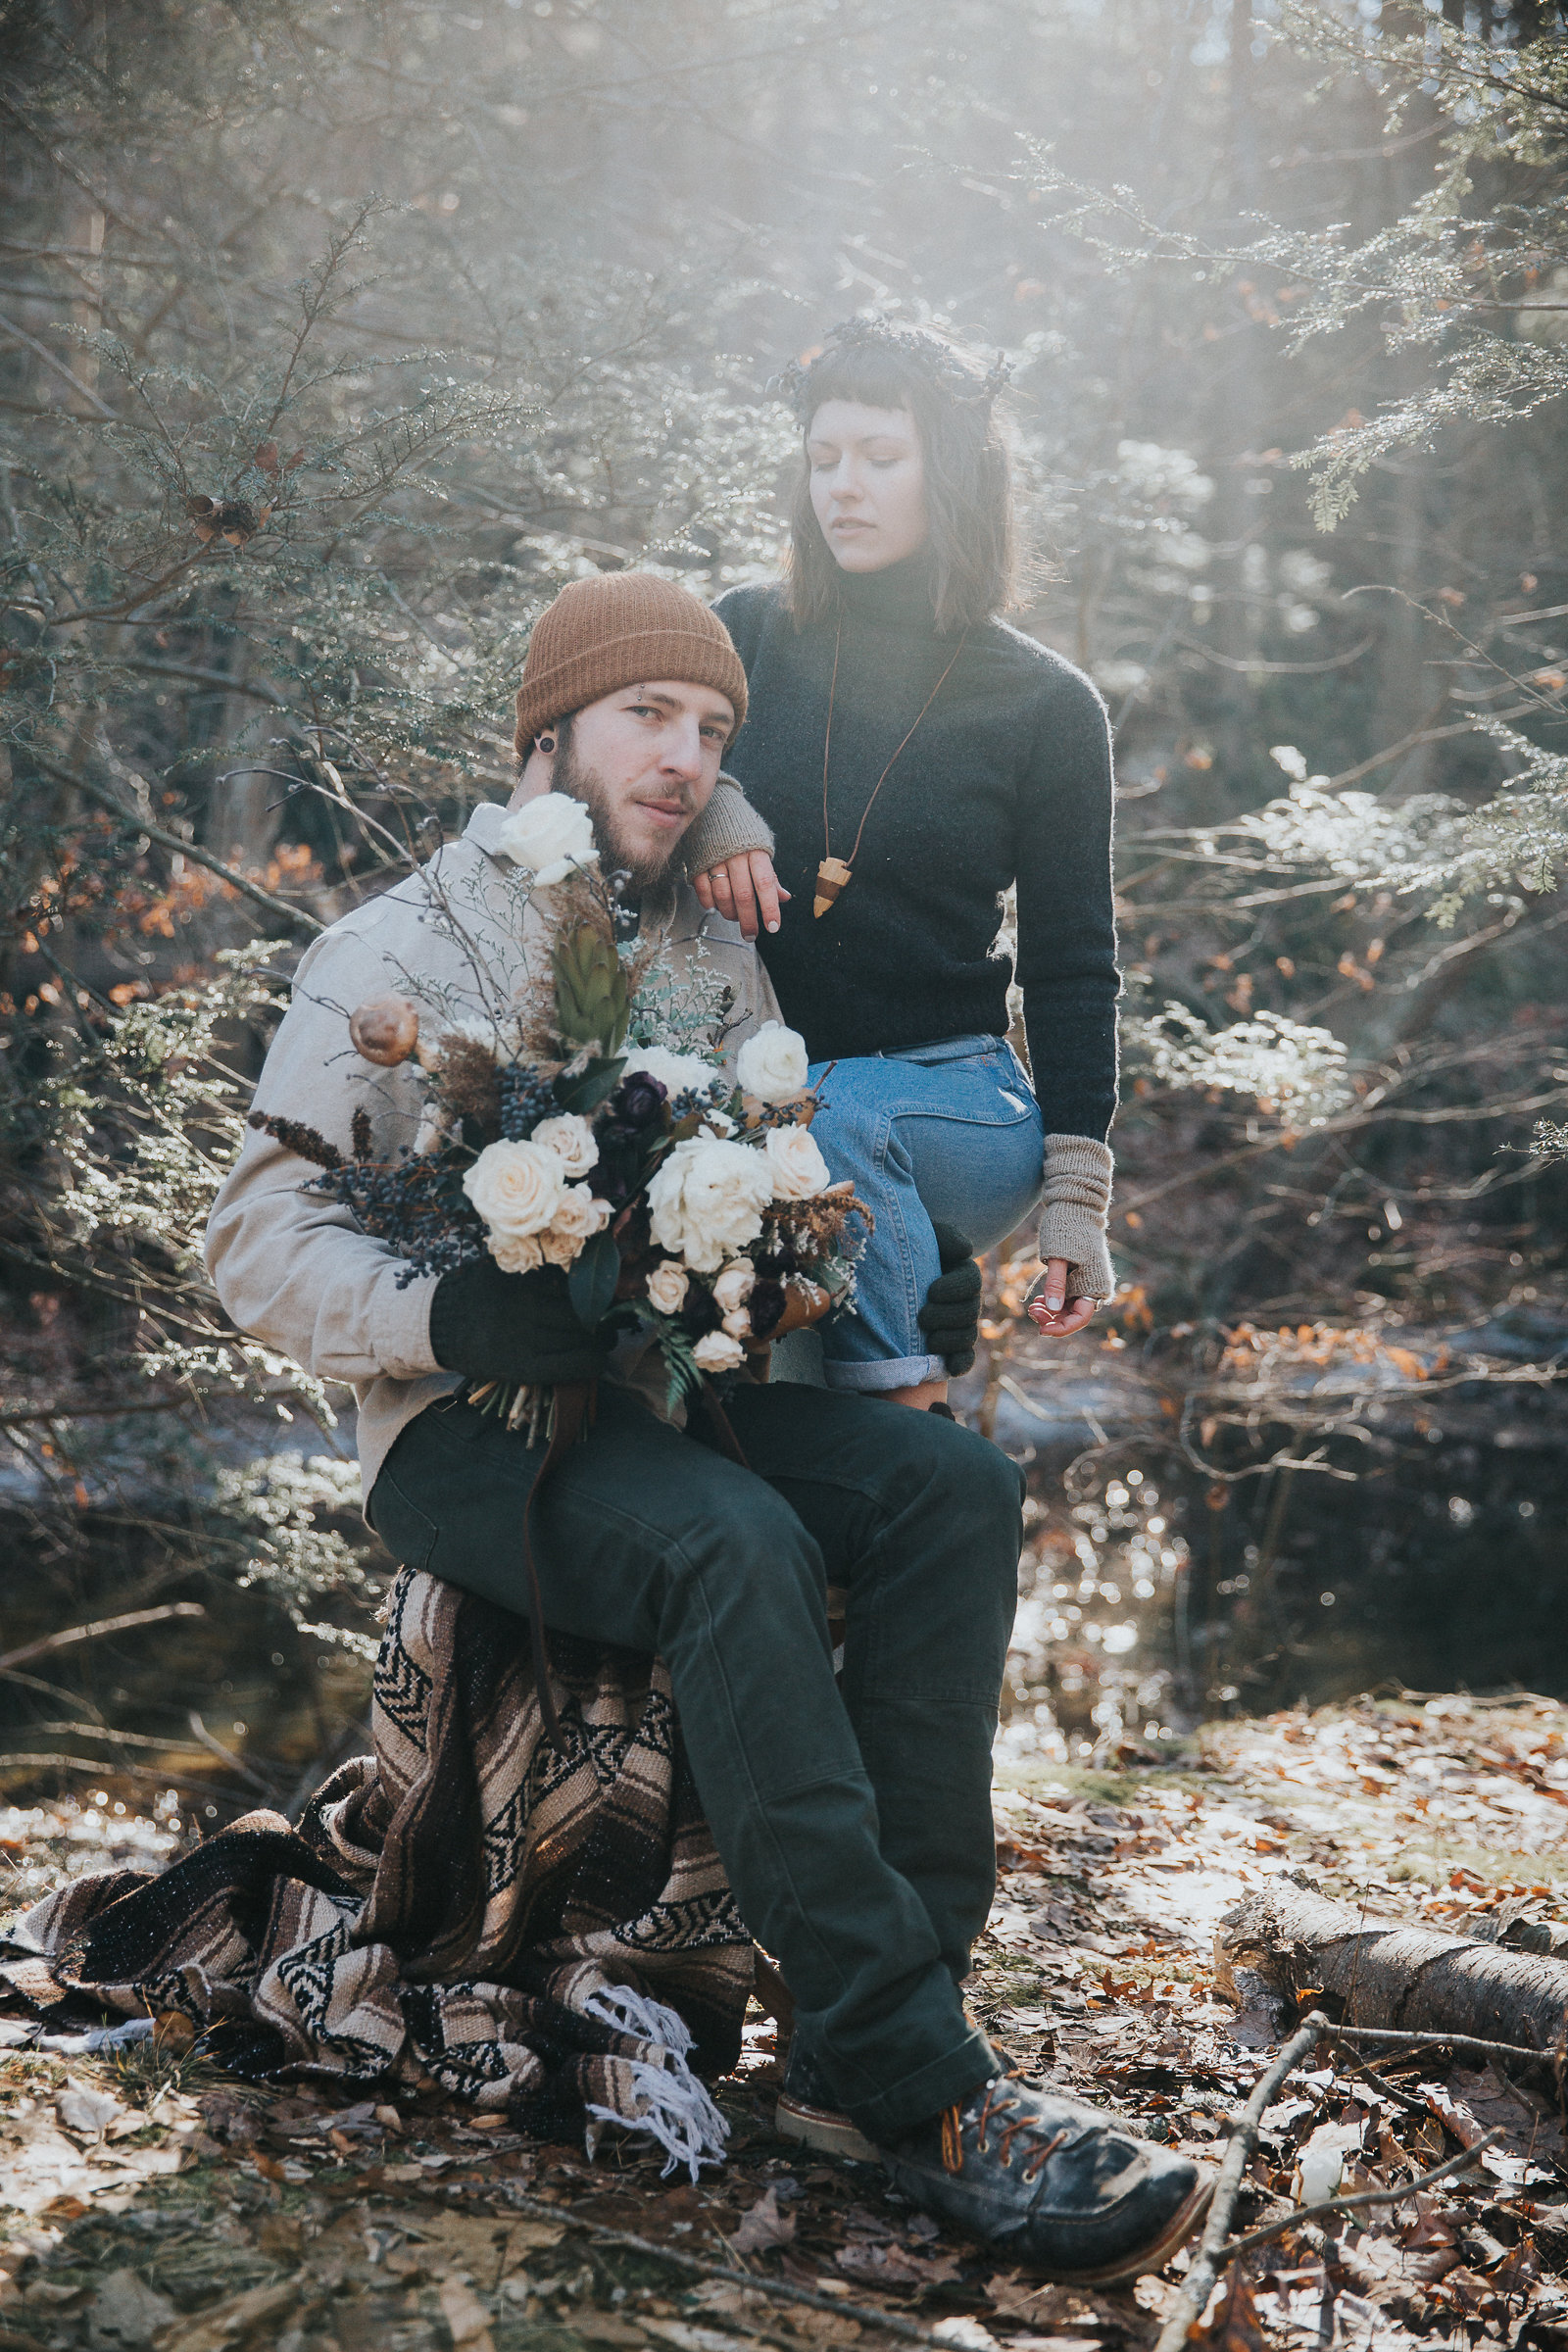 Amiee Blasko Photography, Chris Weslosky and Ashley Jade